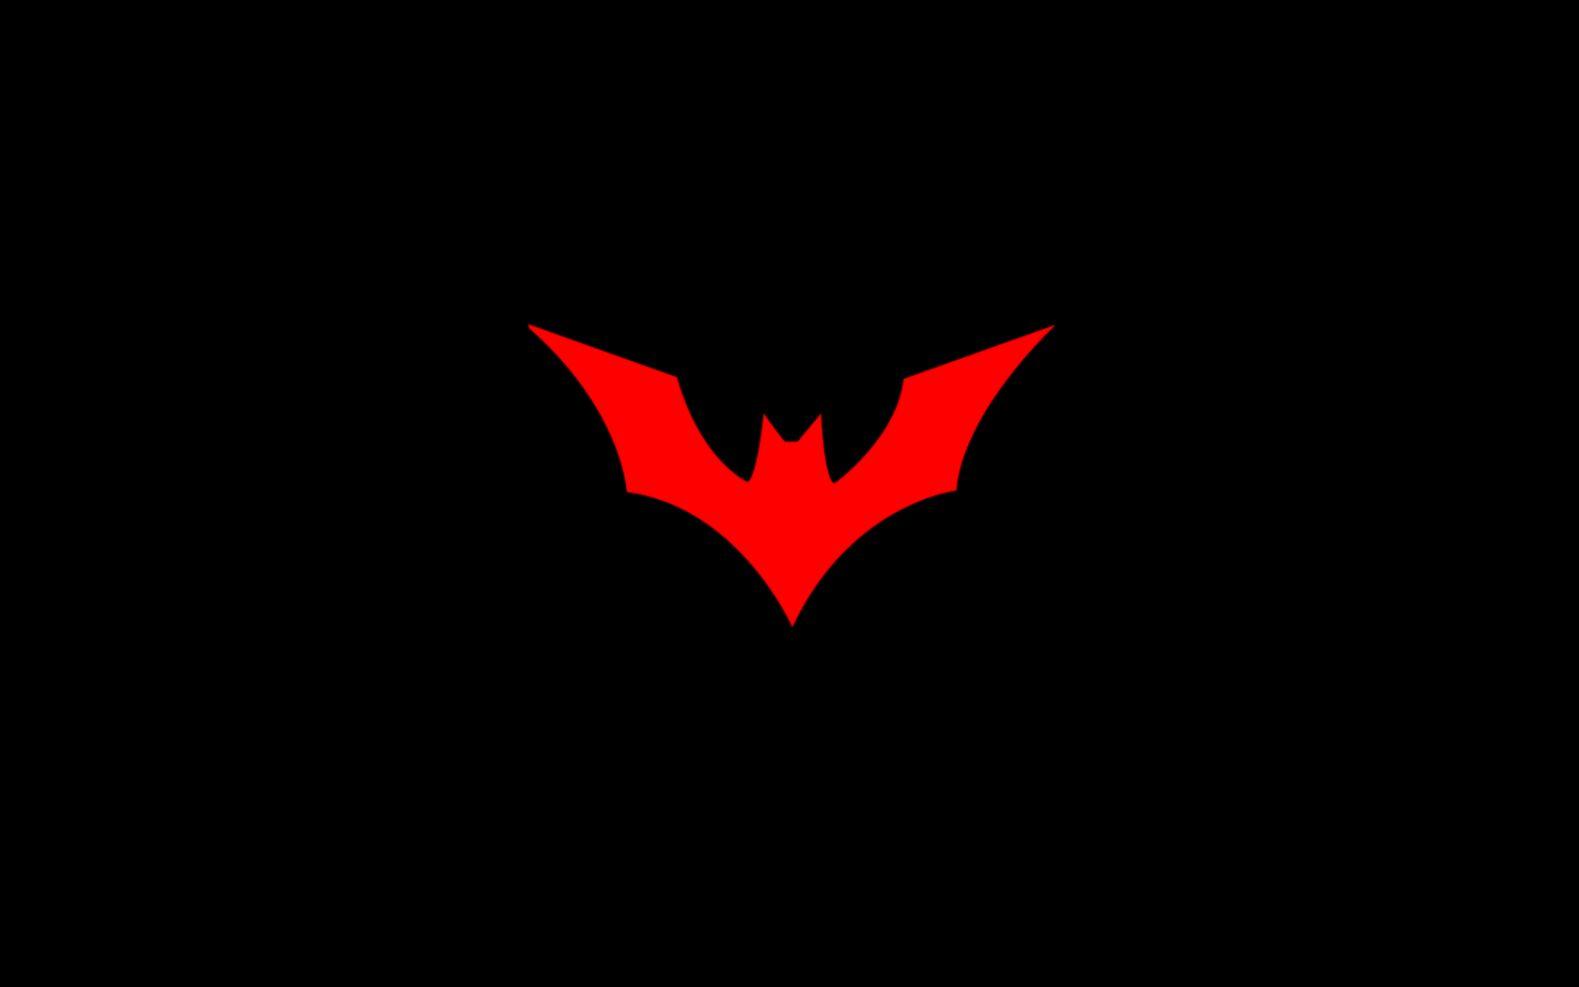 Cool Minimalist Batman Logo Wallpaper In Black And Red PaperPull